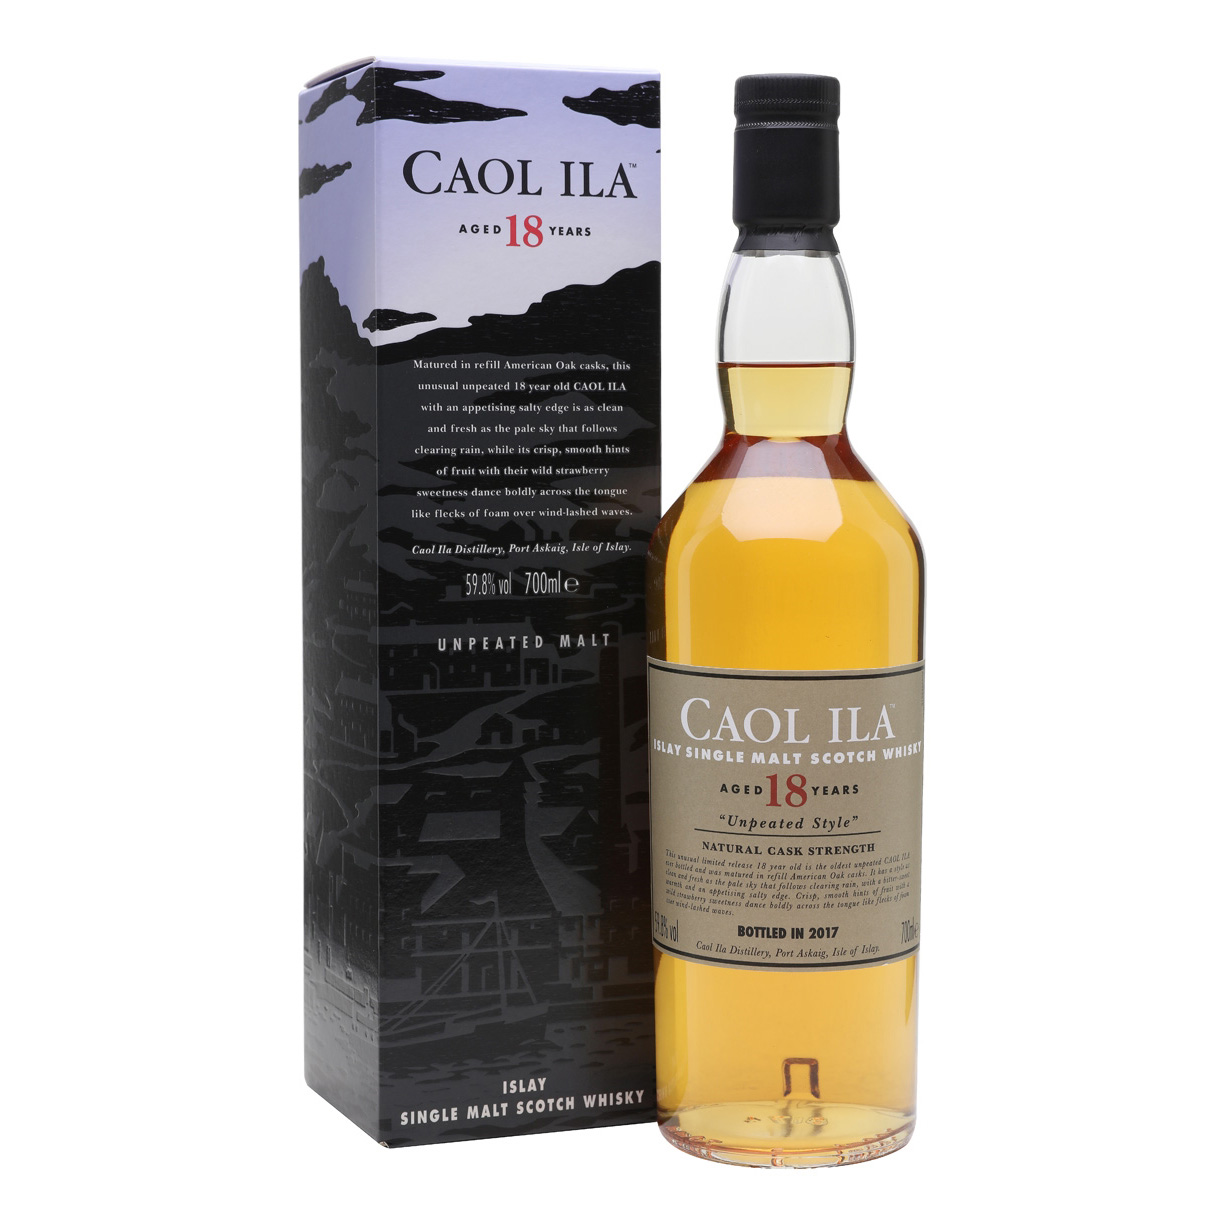 Caol Ila 18 Year Old Single Malt Scotch Whisky (Unpeated Cask Strength 2017 Edition)